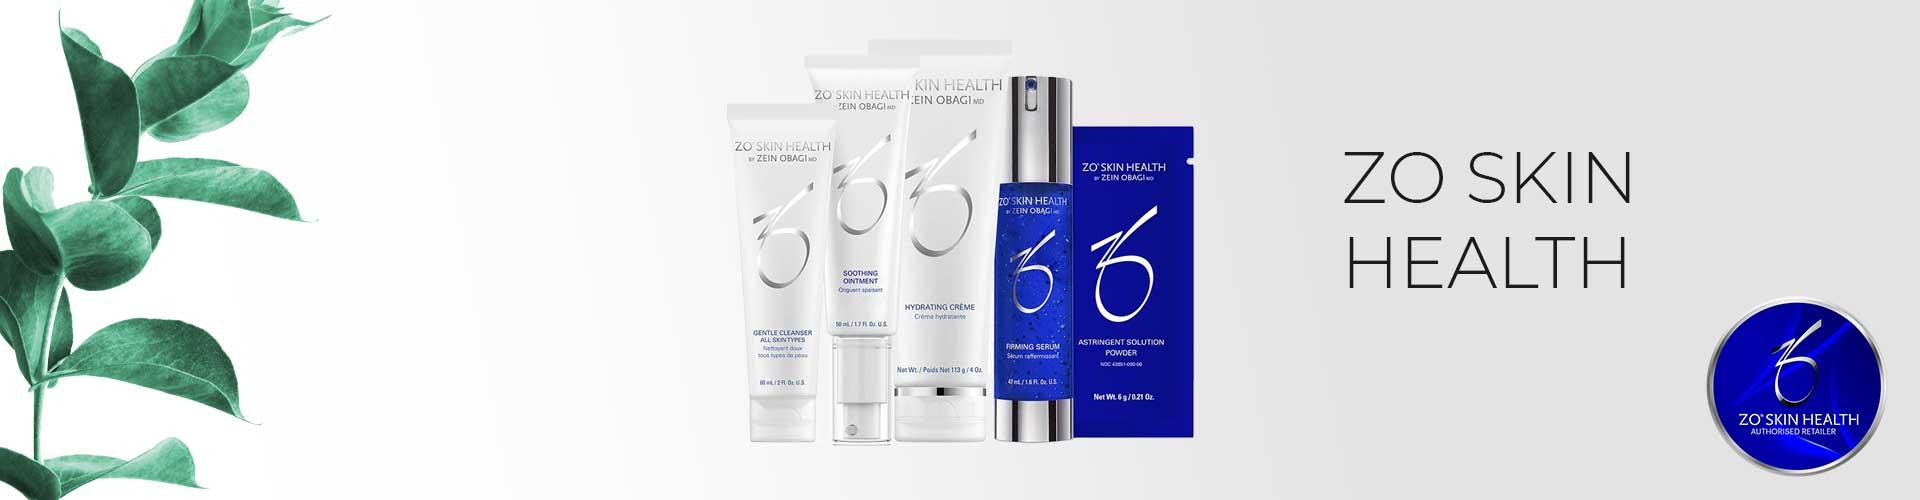 Zo Skin Health Product Banner